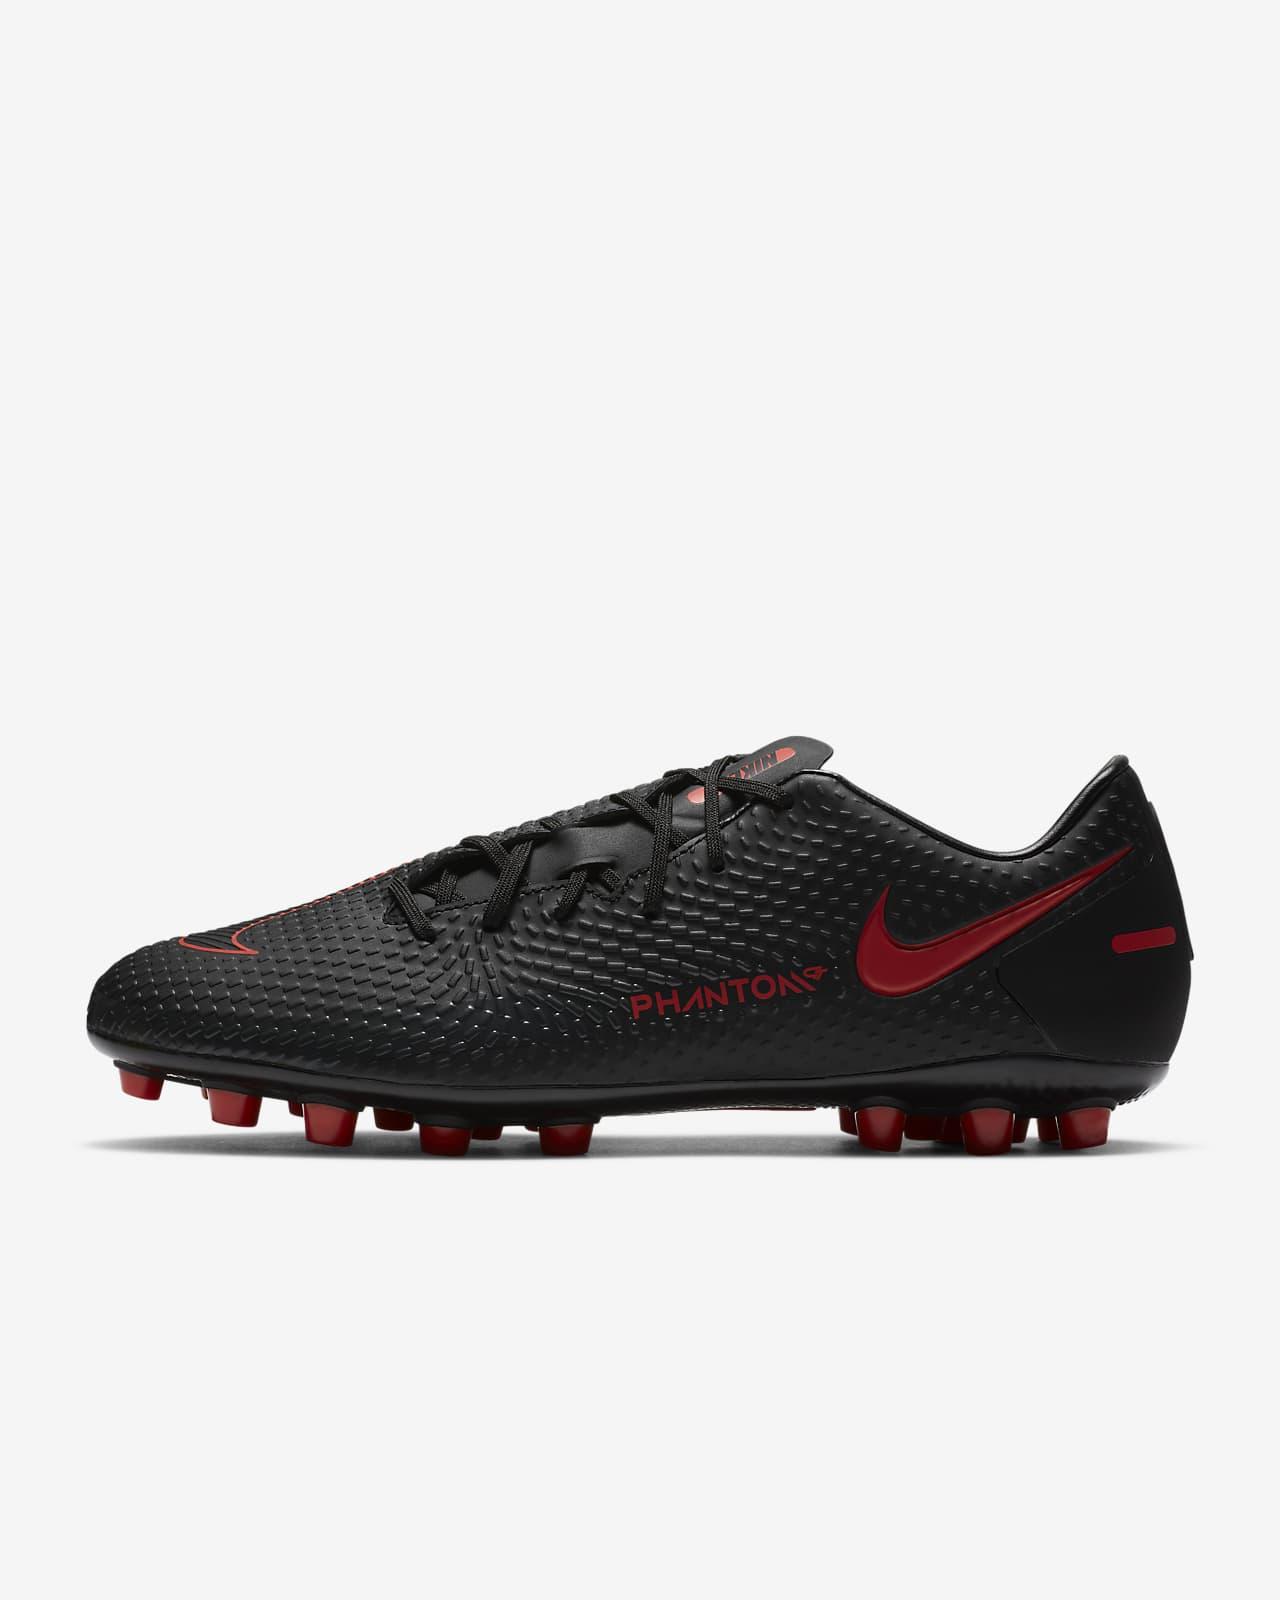 Nike Phantom GT Academy AG Artificial-Grass Football Boot